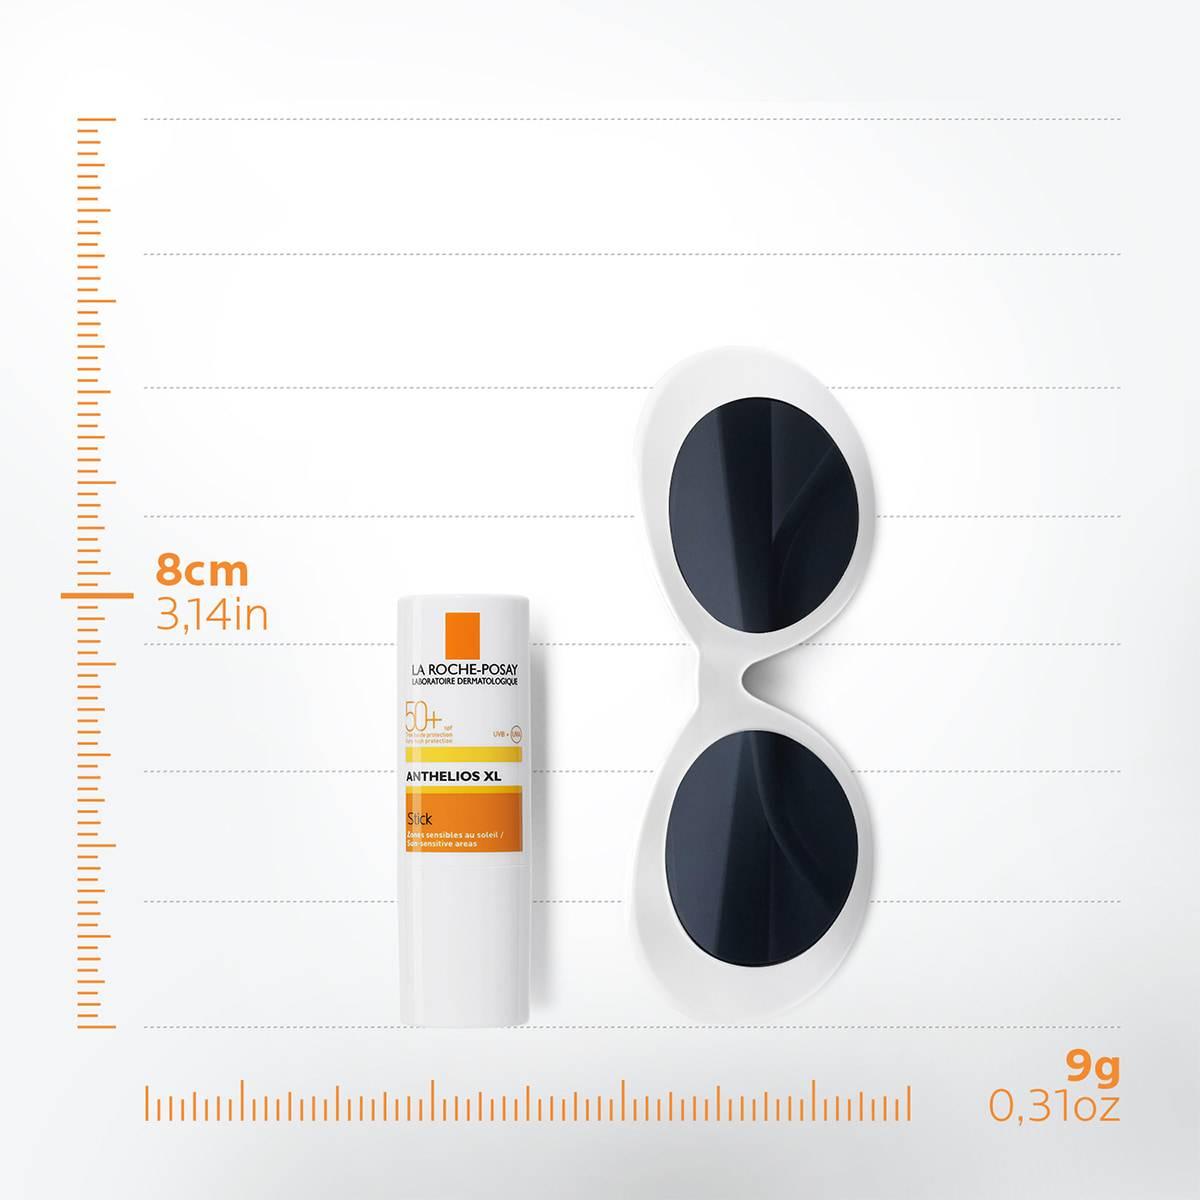 La Roche Posay Tuotesivu Aurinko Anthelios XL Stick Sensitive Area Spf50